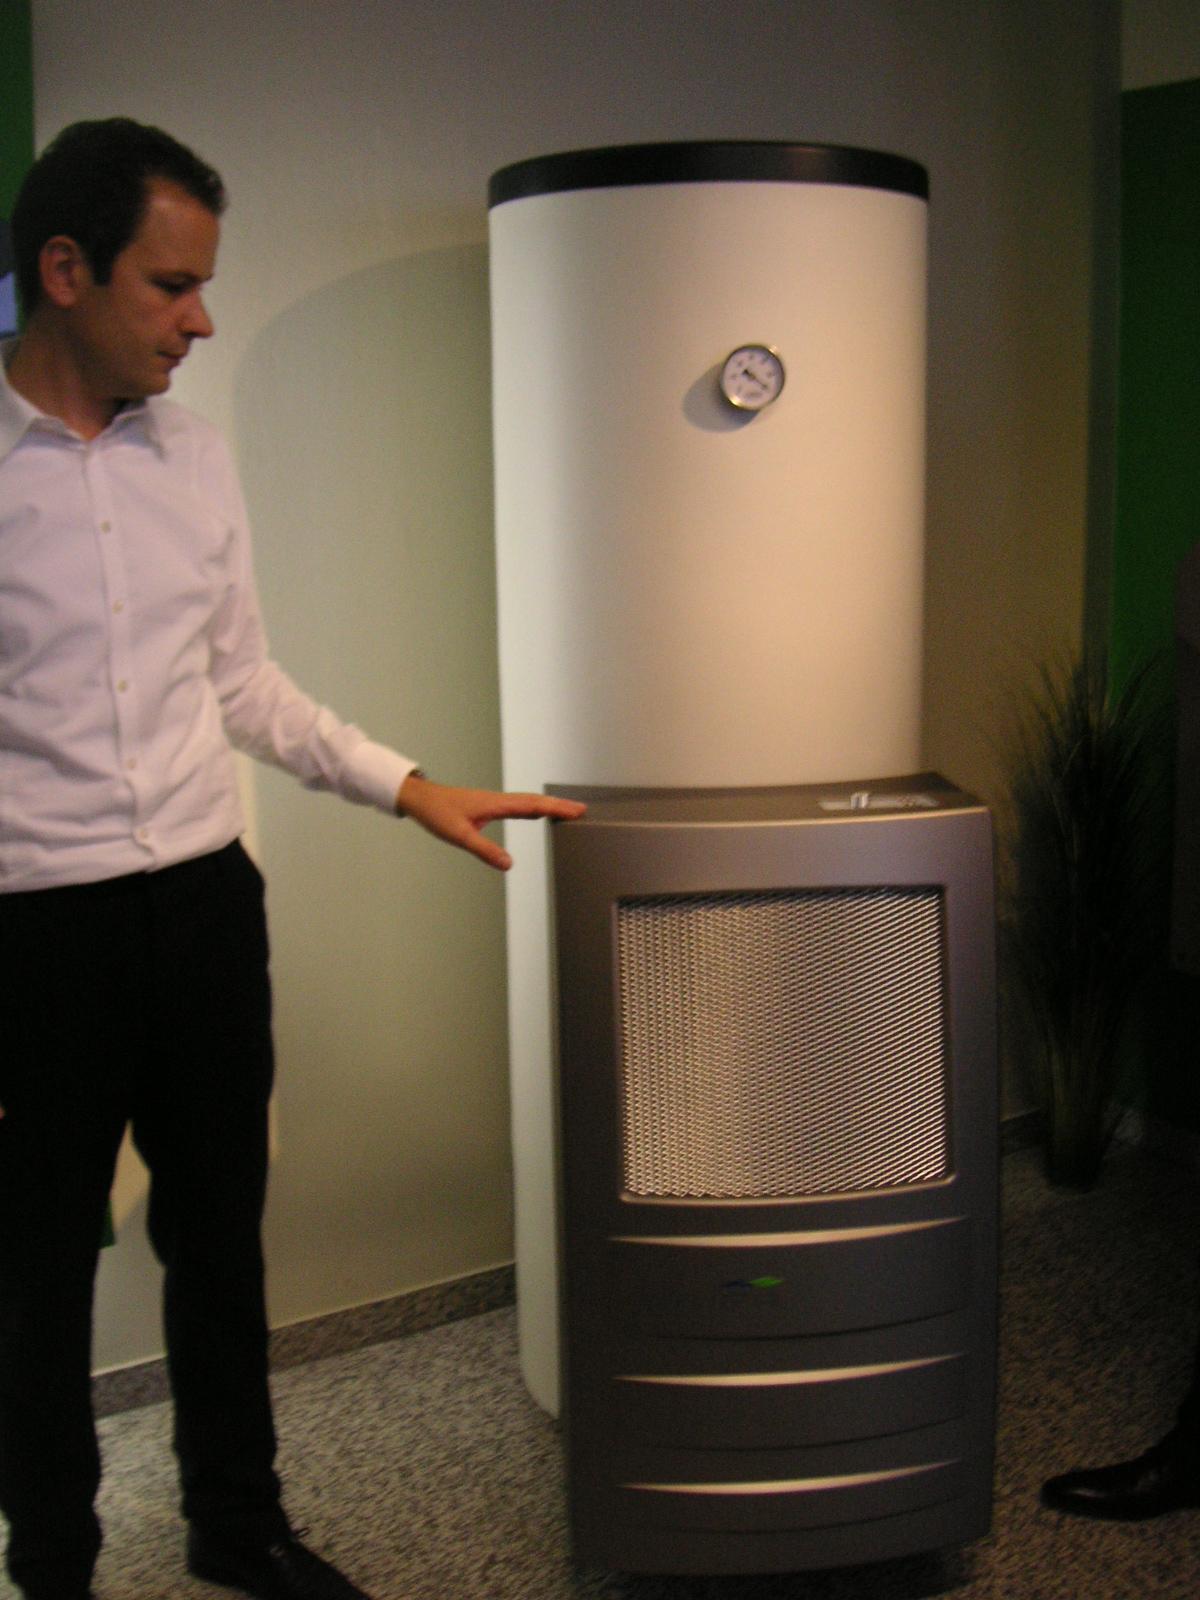 Neura warm water heat pump